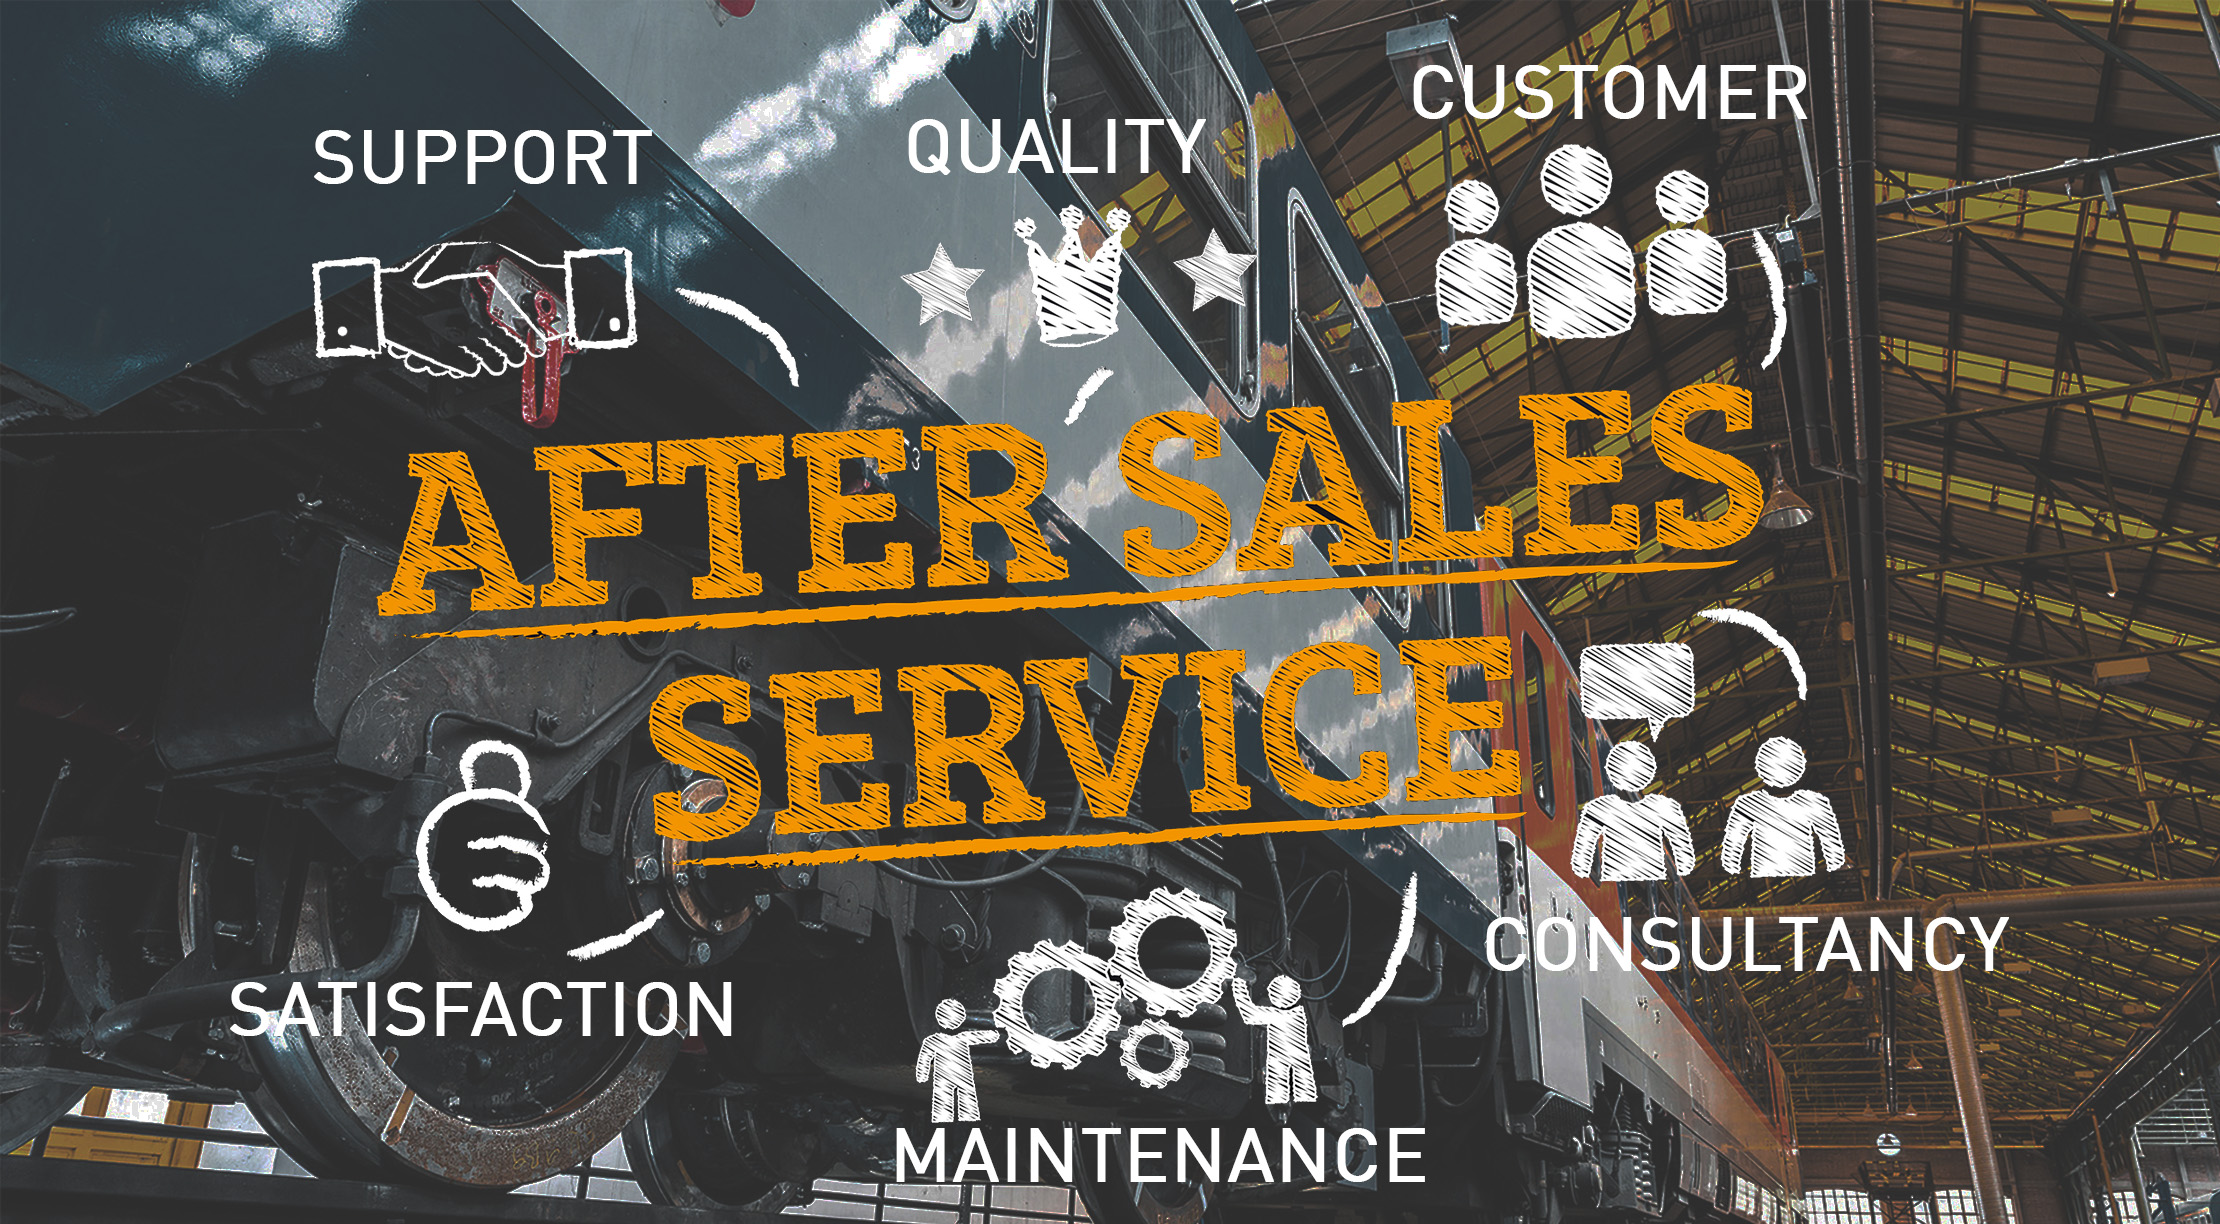 After sales service as competitive advantage